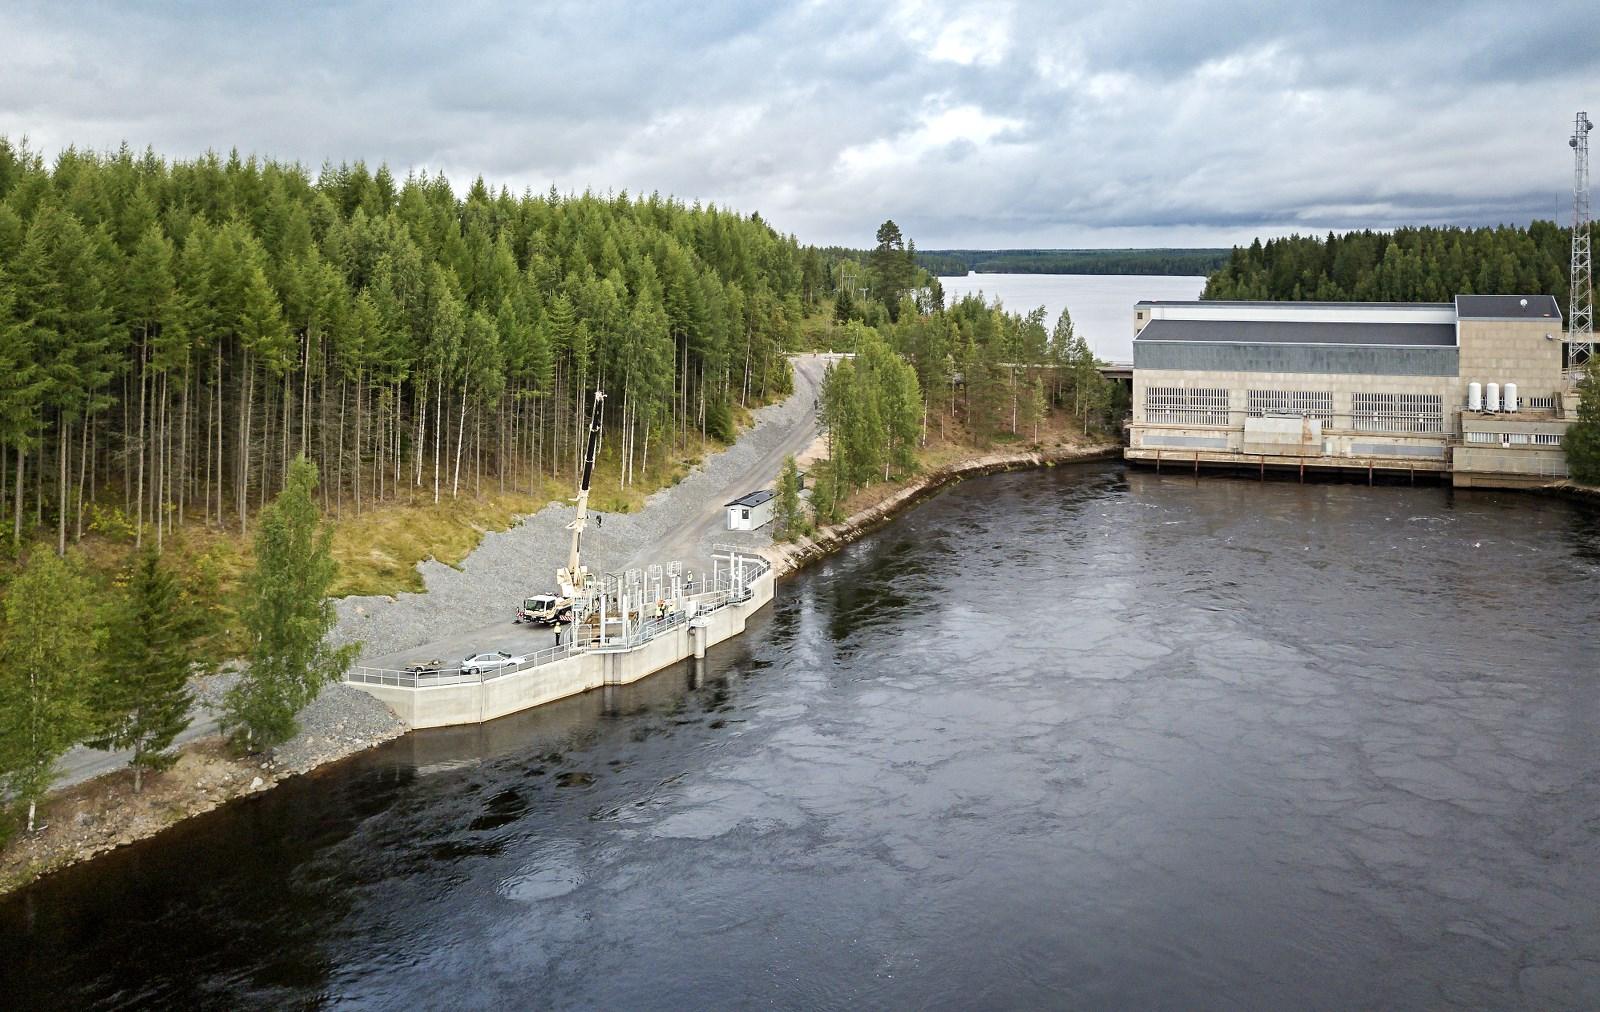 Montta hydro power plant